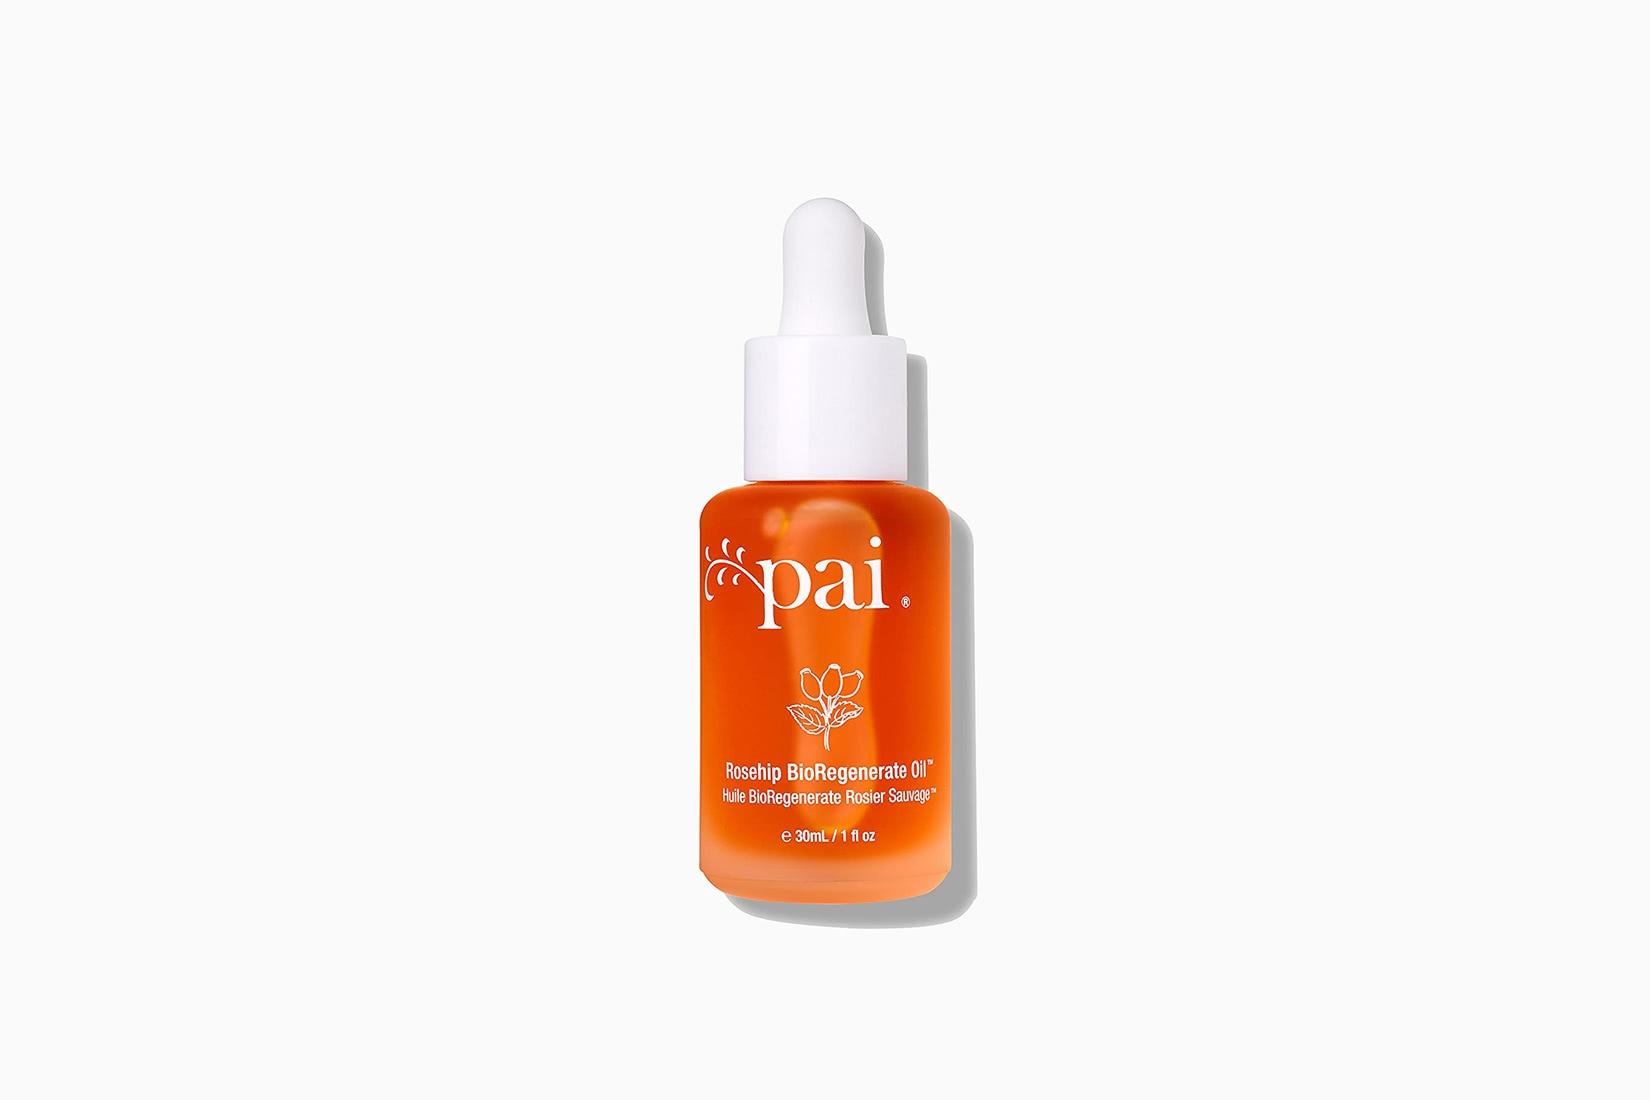 best natural organic beauty skincare pai skincare bioregenerate oil - Luxe Digital